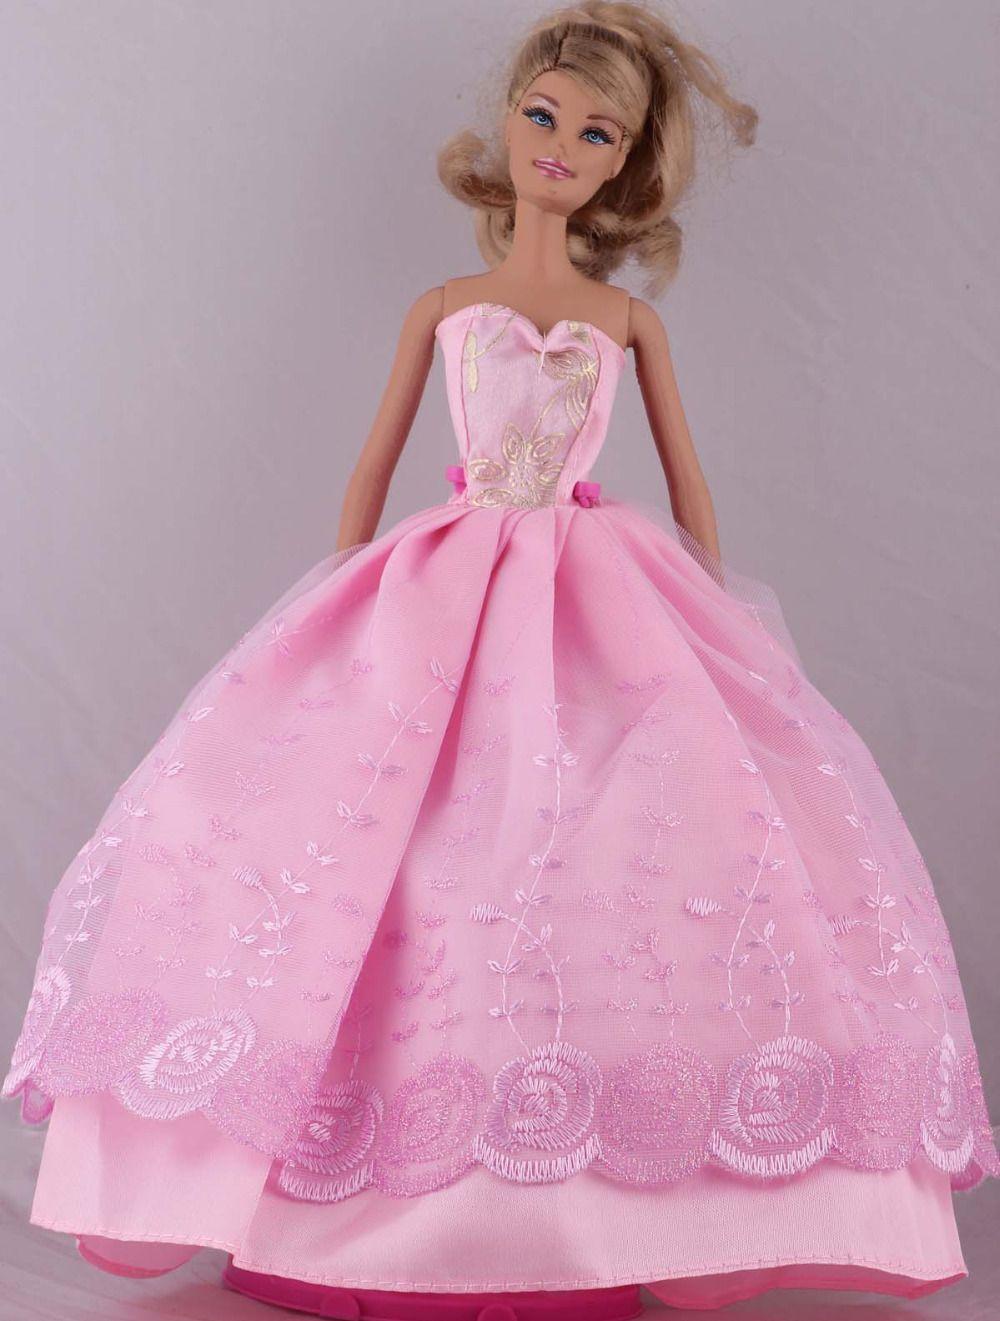 Barato Handmade rosa vestido / vestido de festa vestido de roupas ...